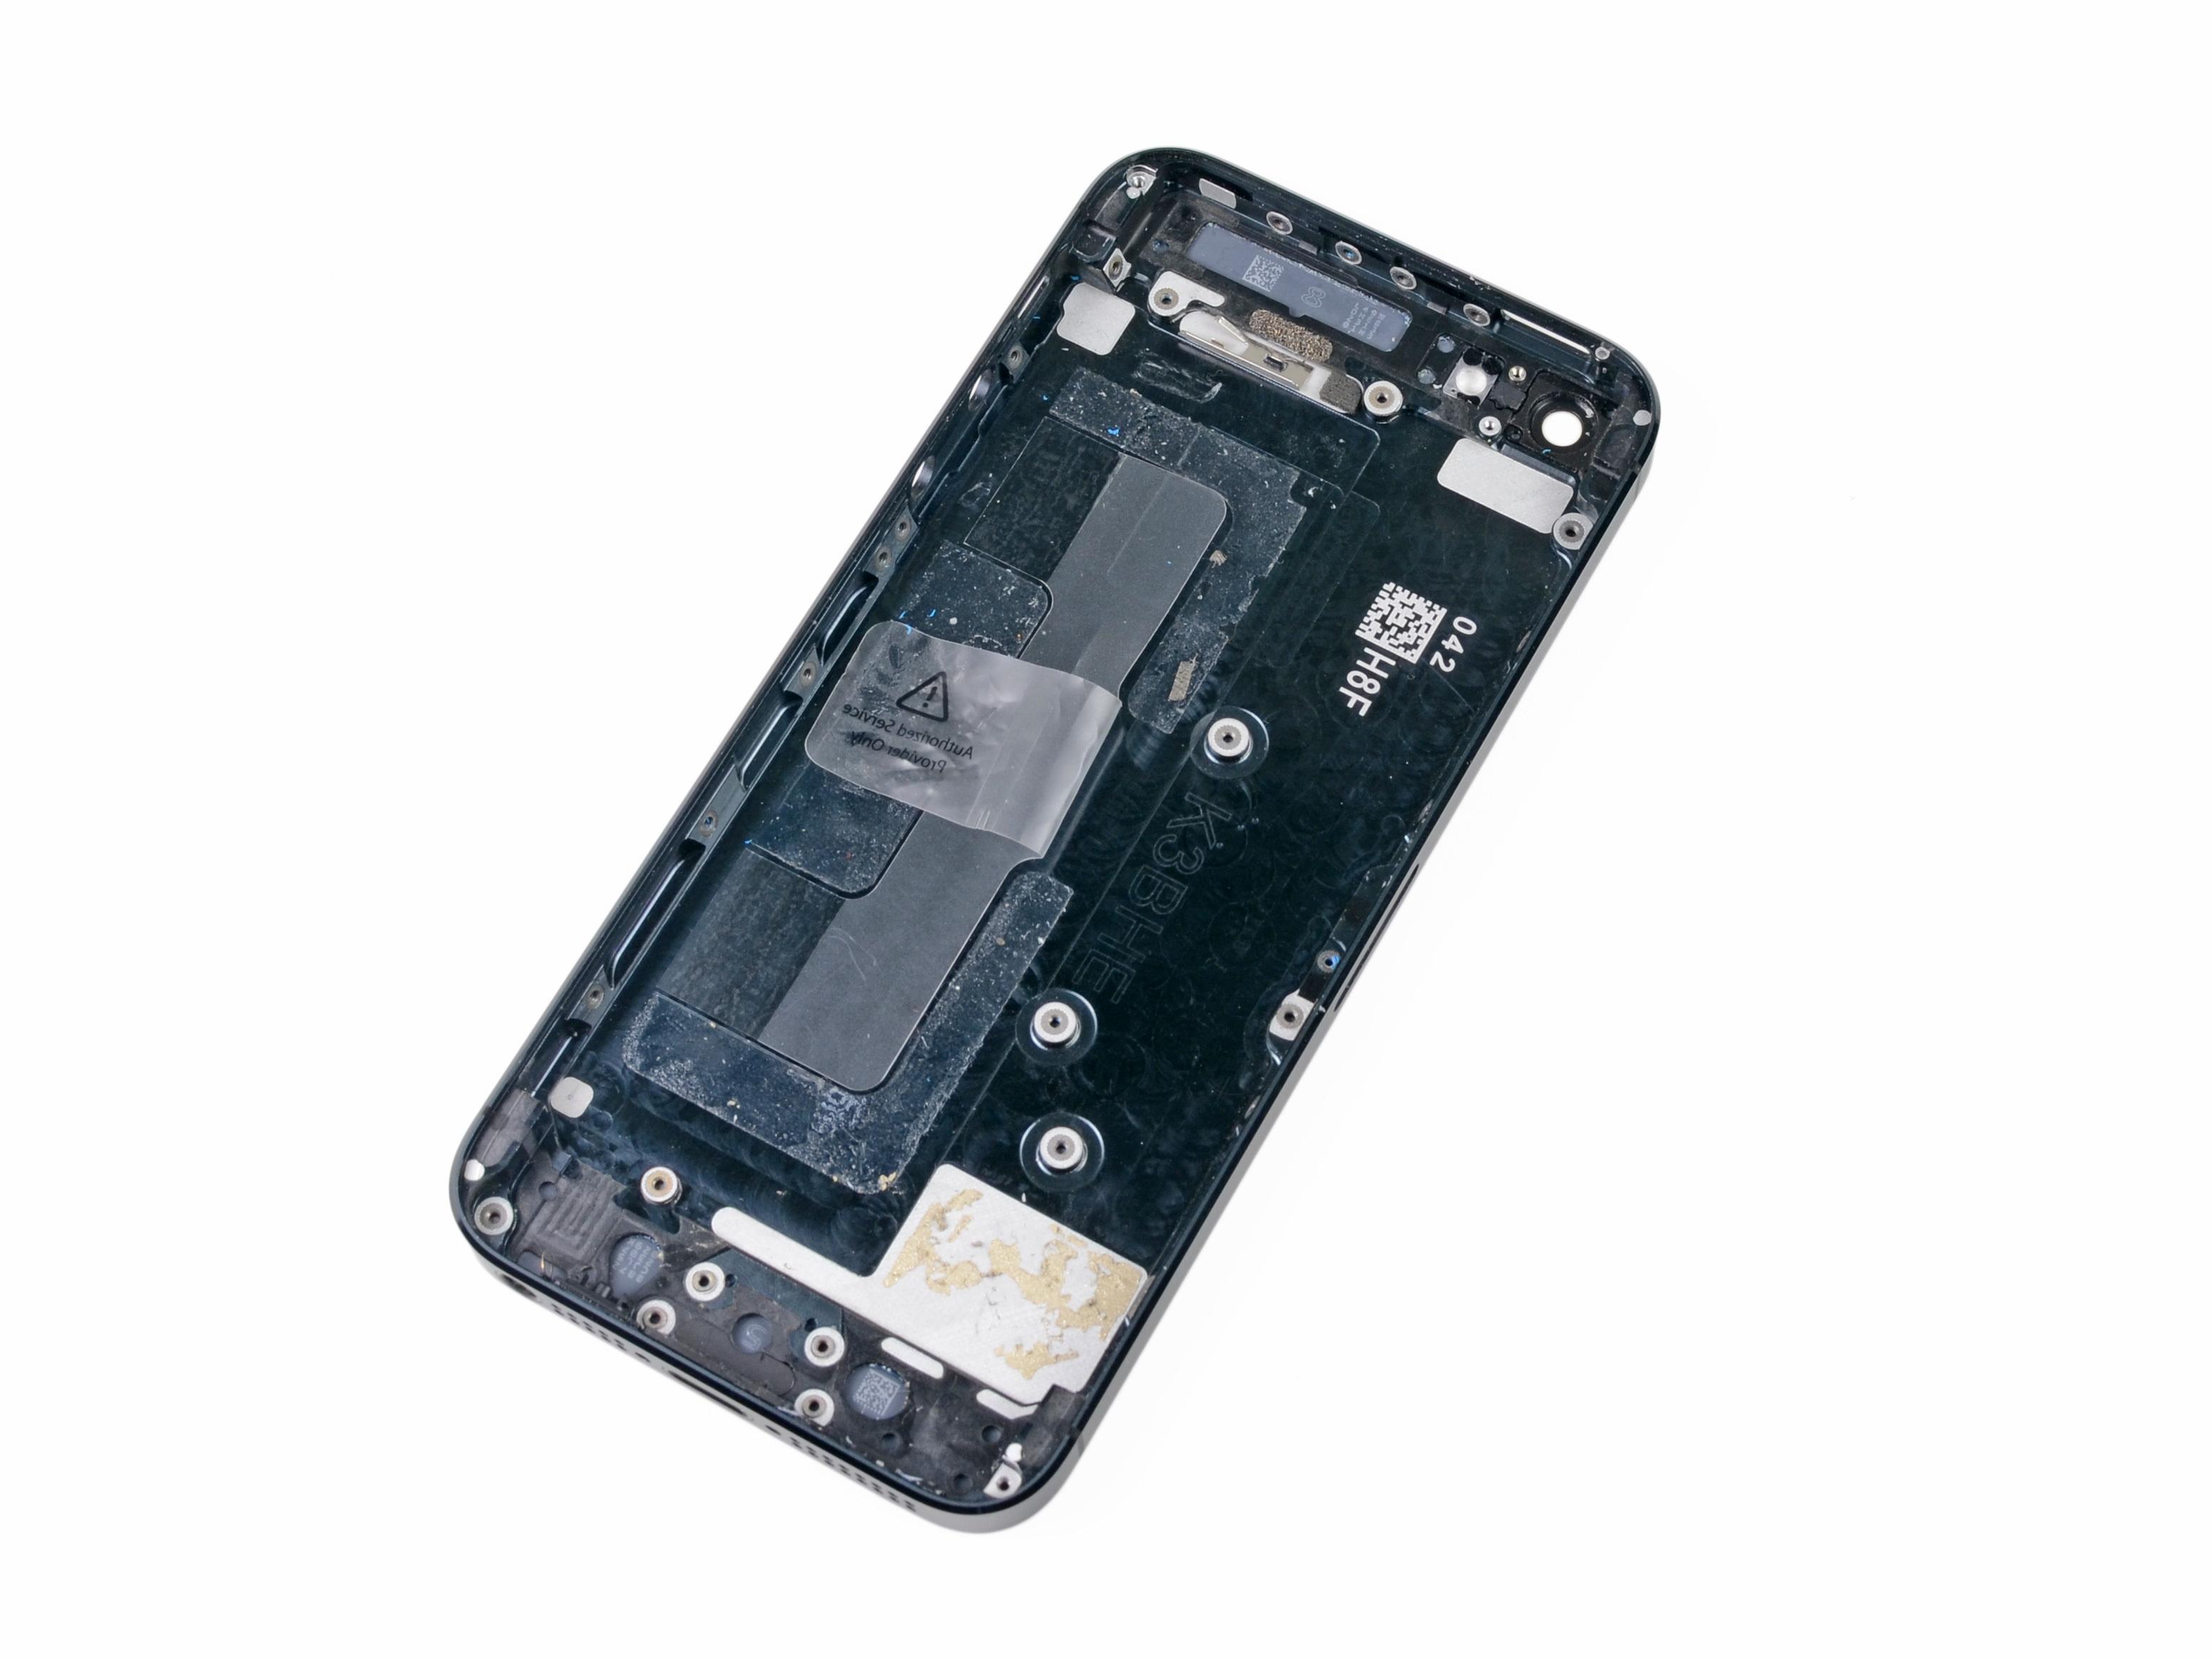 Ремонт iPhone 3G - фото 7 | Сервисный центр Total Apple